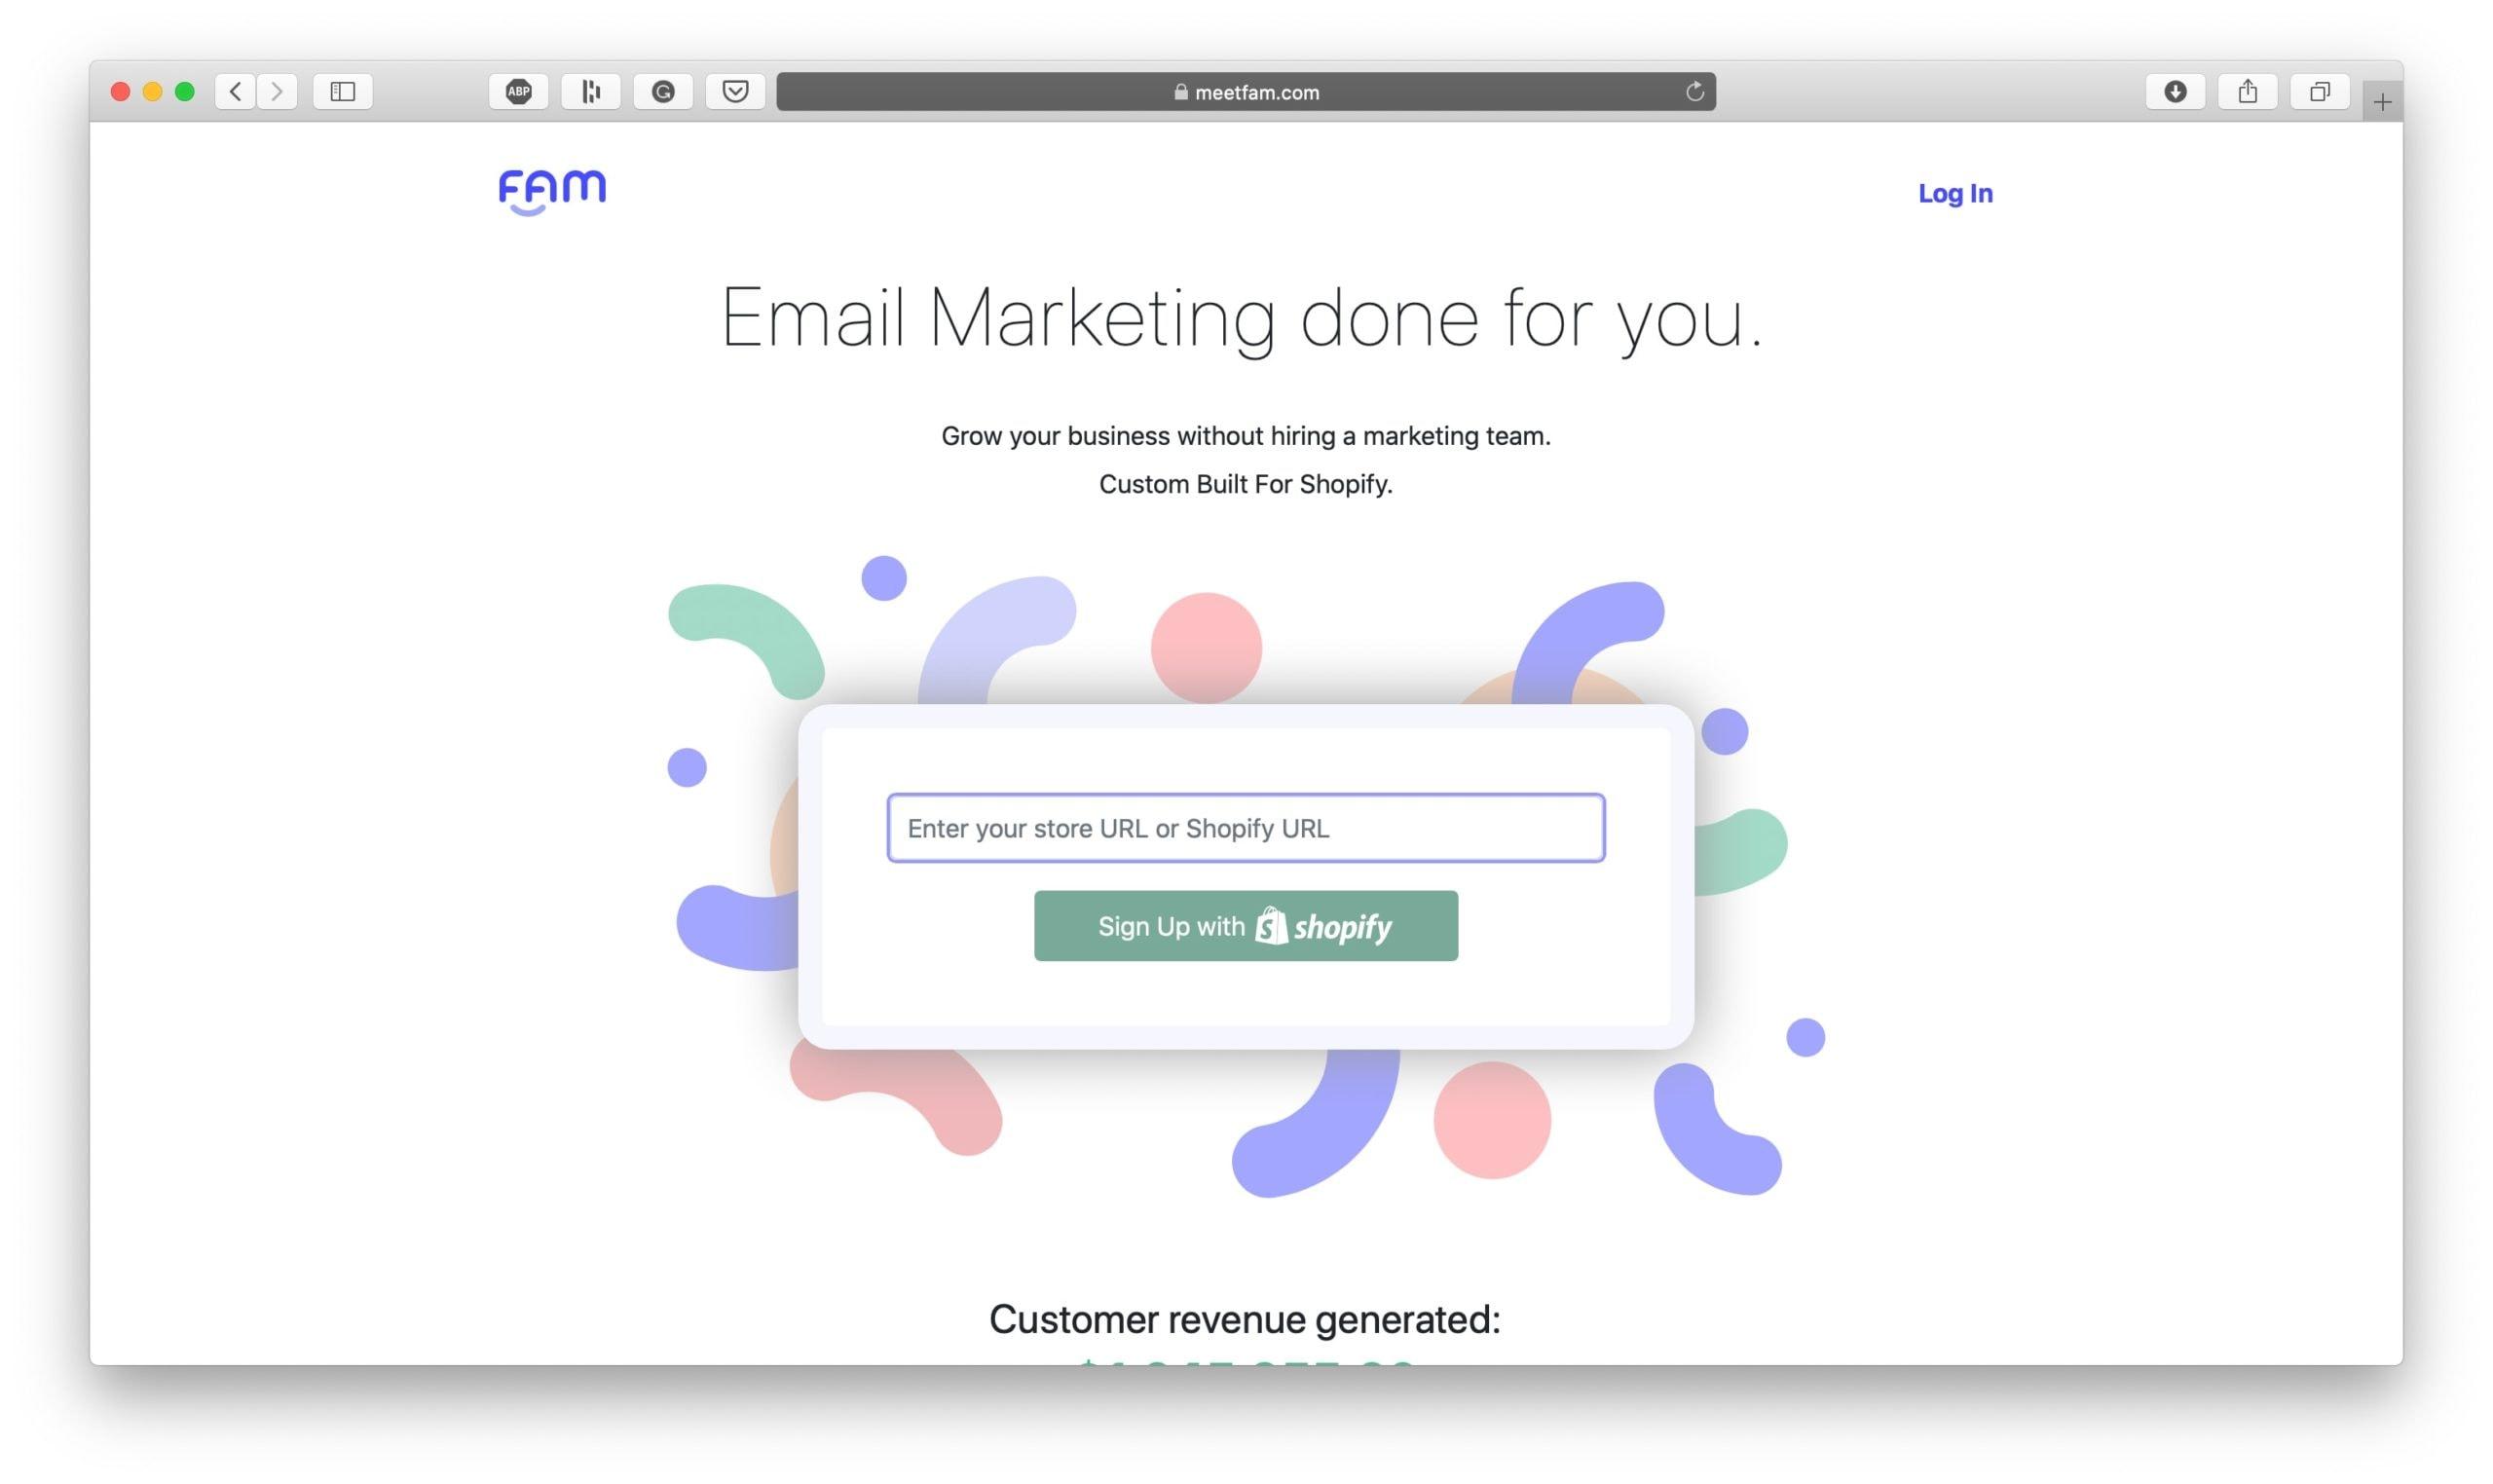 FAM Email Marketing